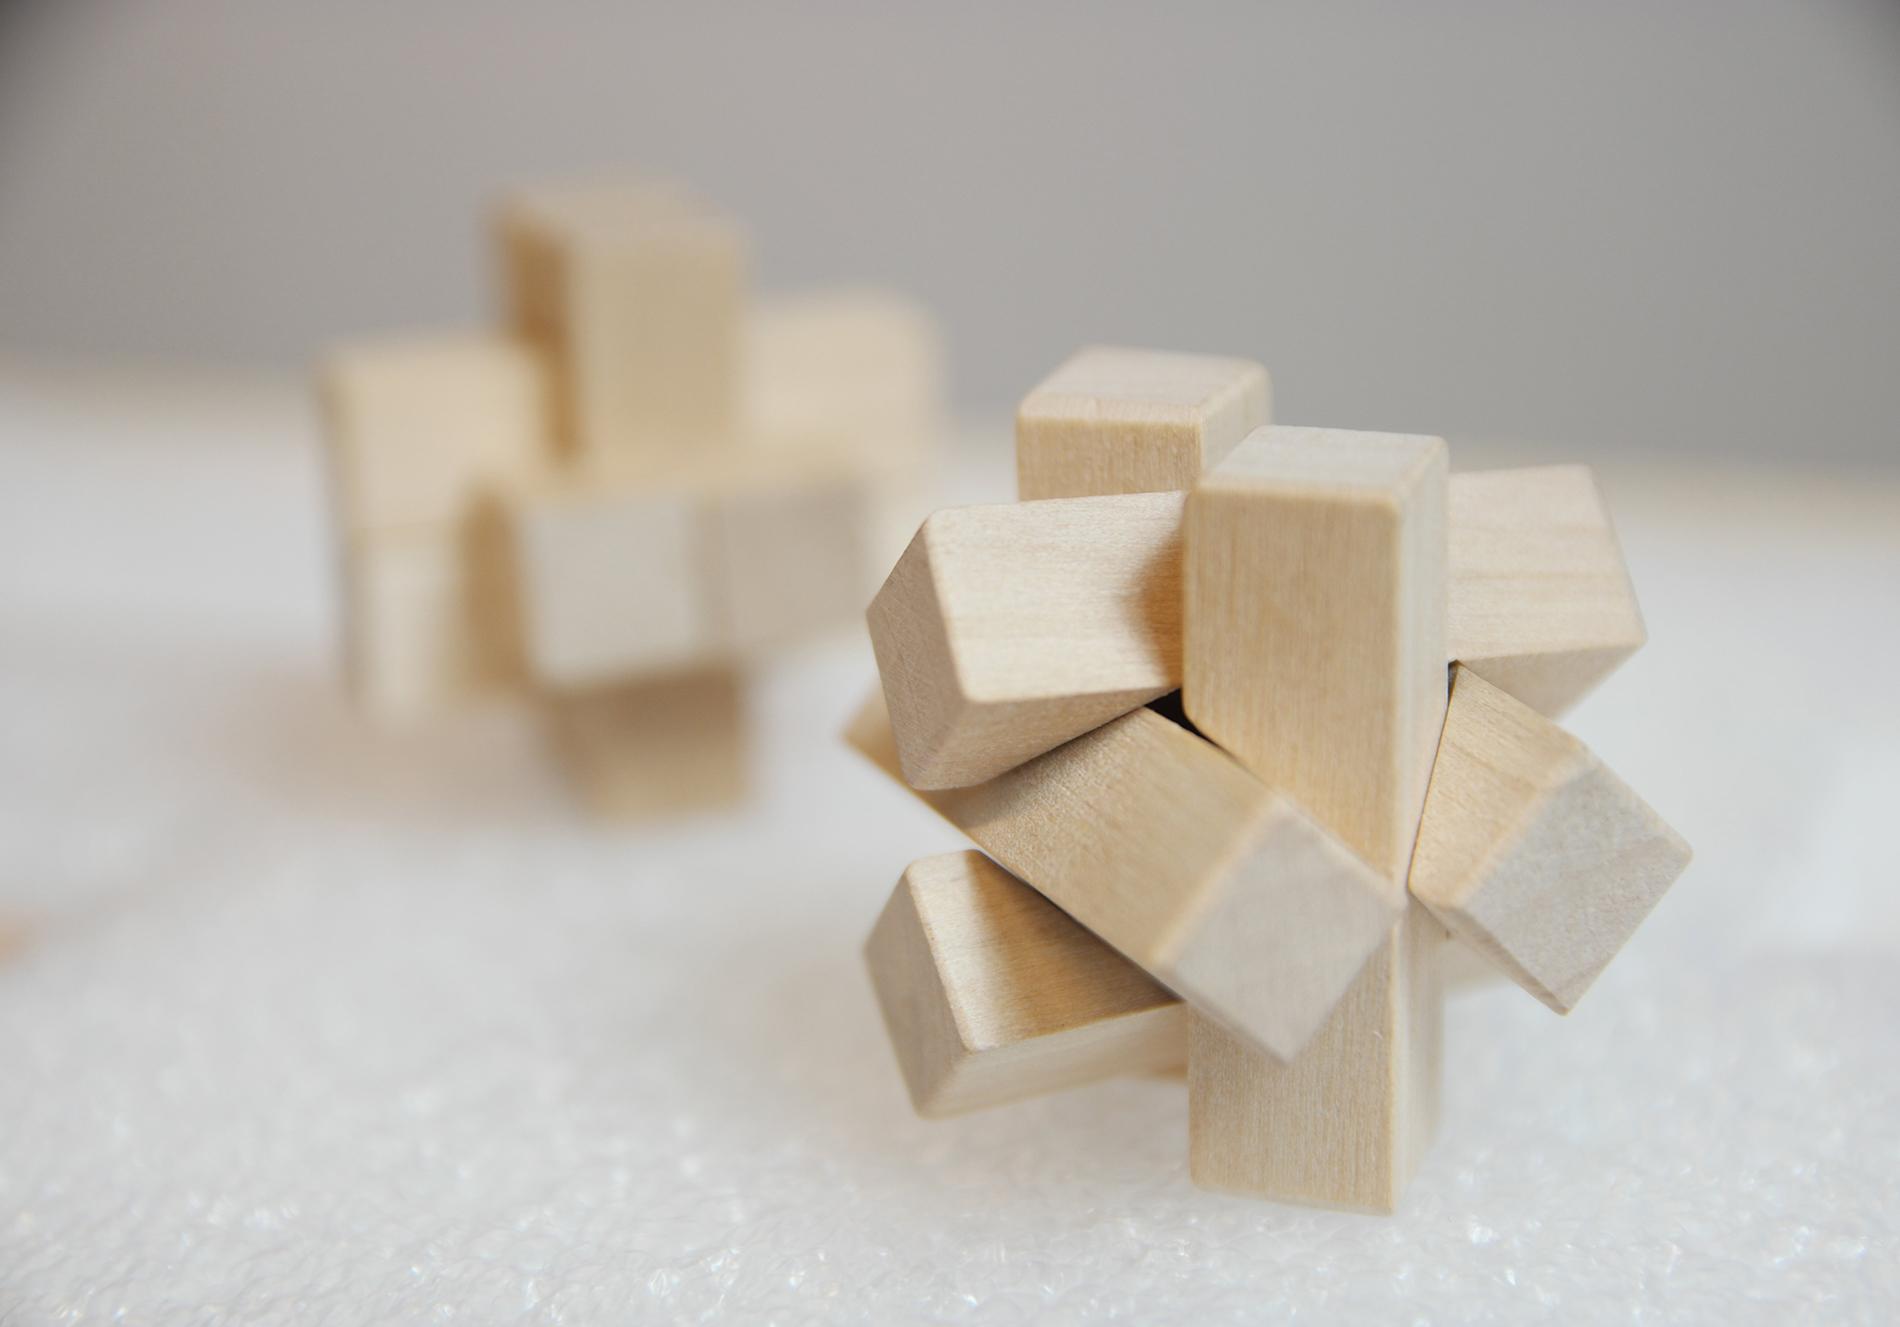 Six woodenblocks linked together.